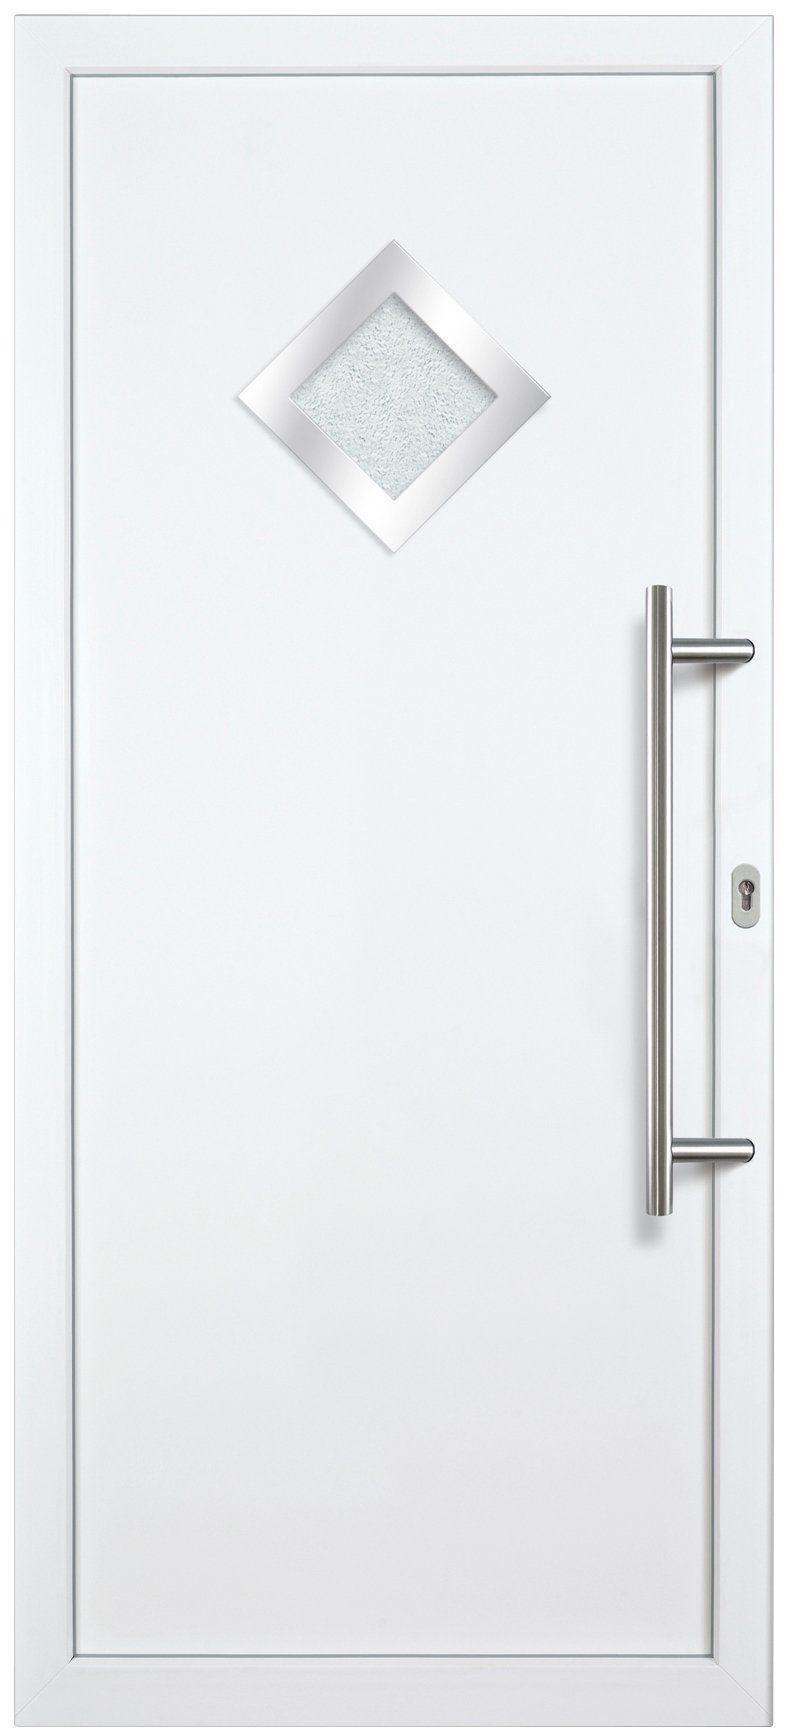 Kunststoff-Haustür »KA632 P« nach Wunschmaß, Türanschlag links